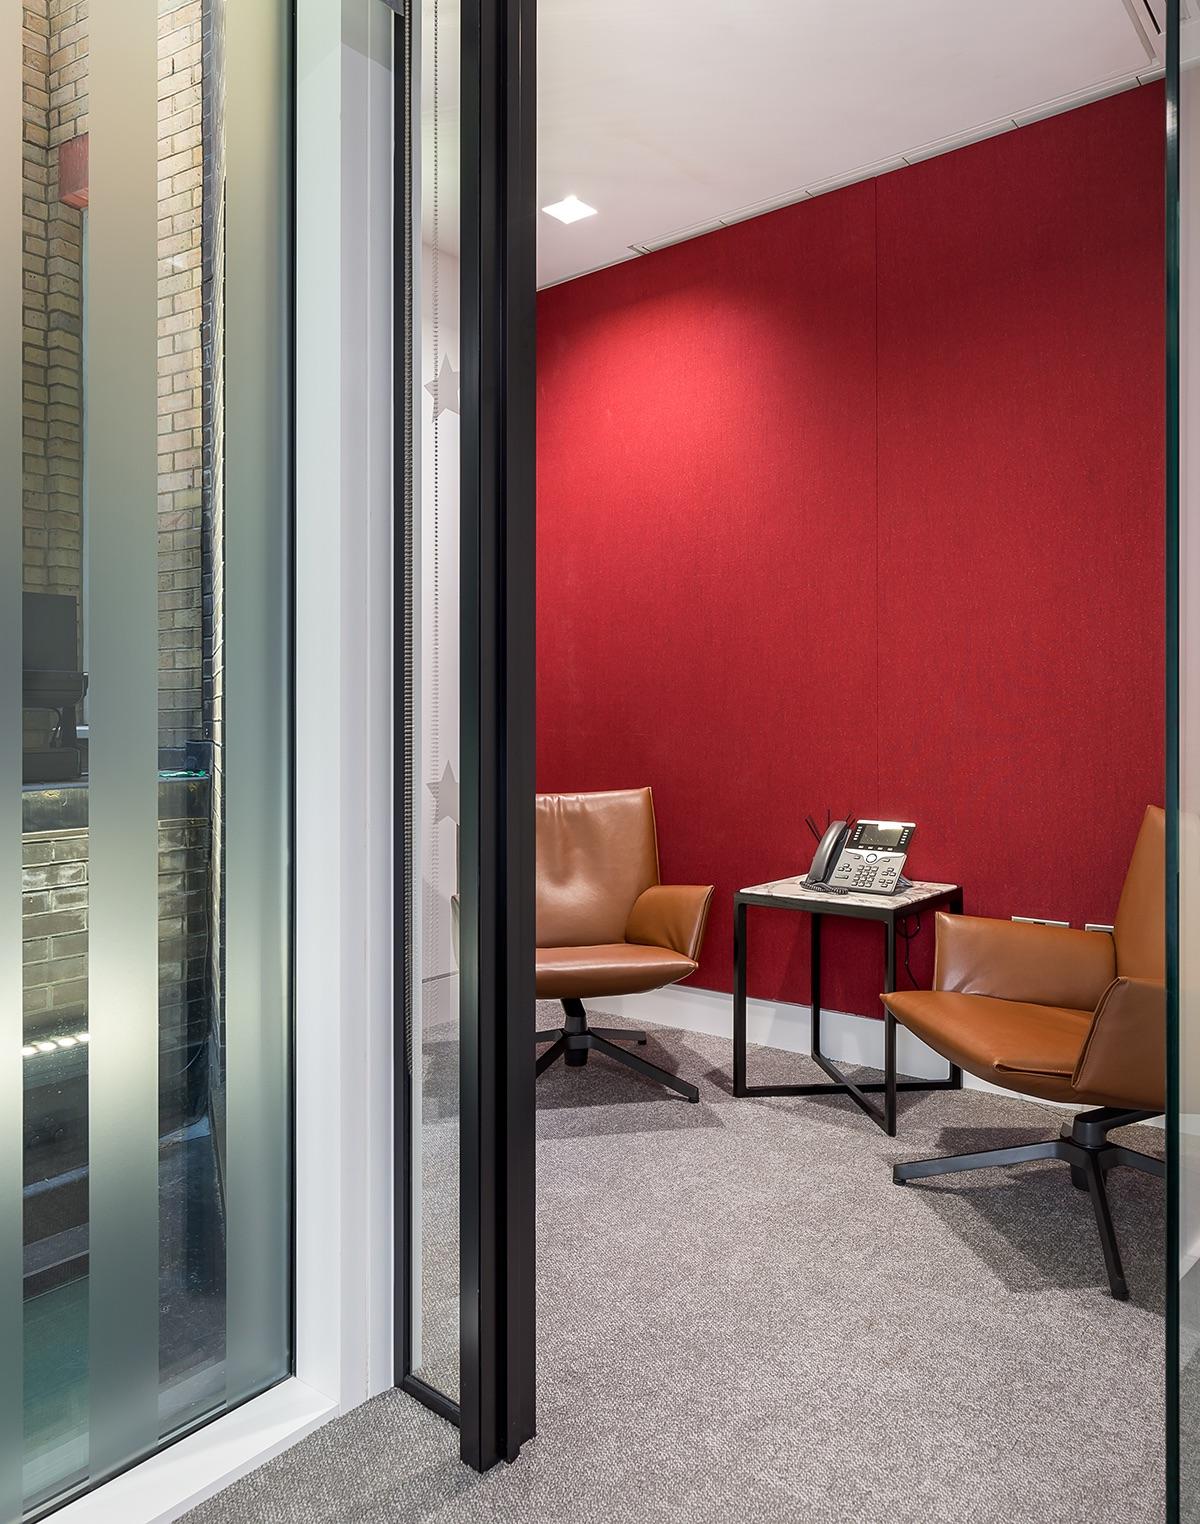 crux-office-london-7